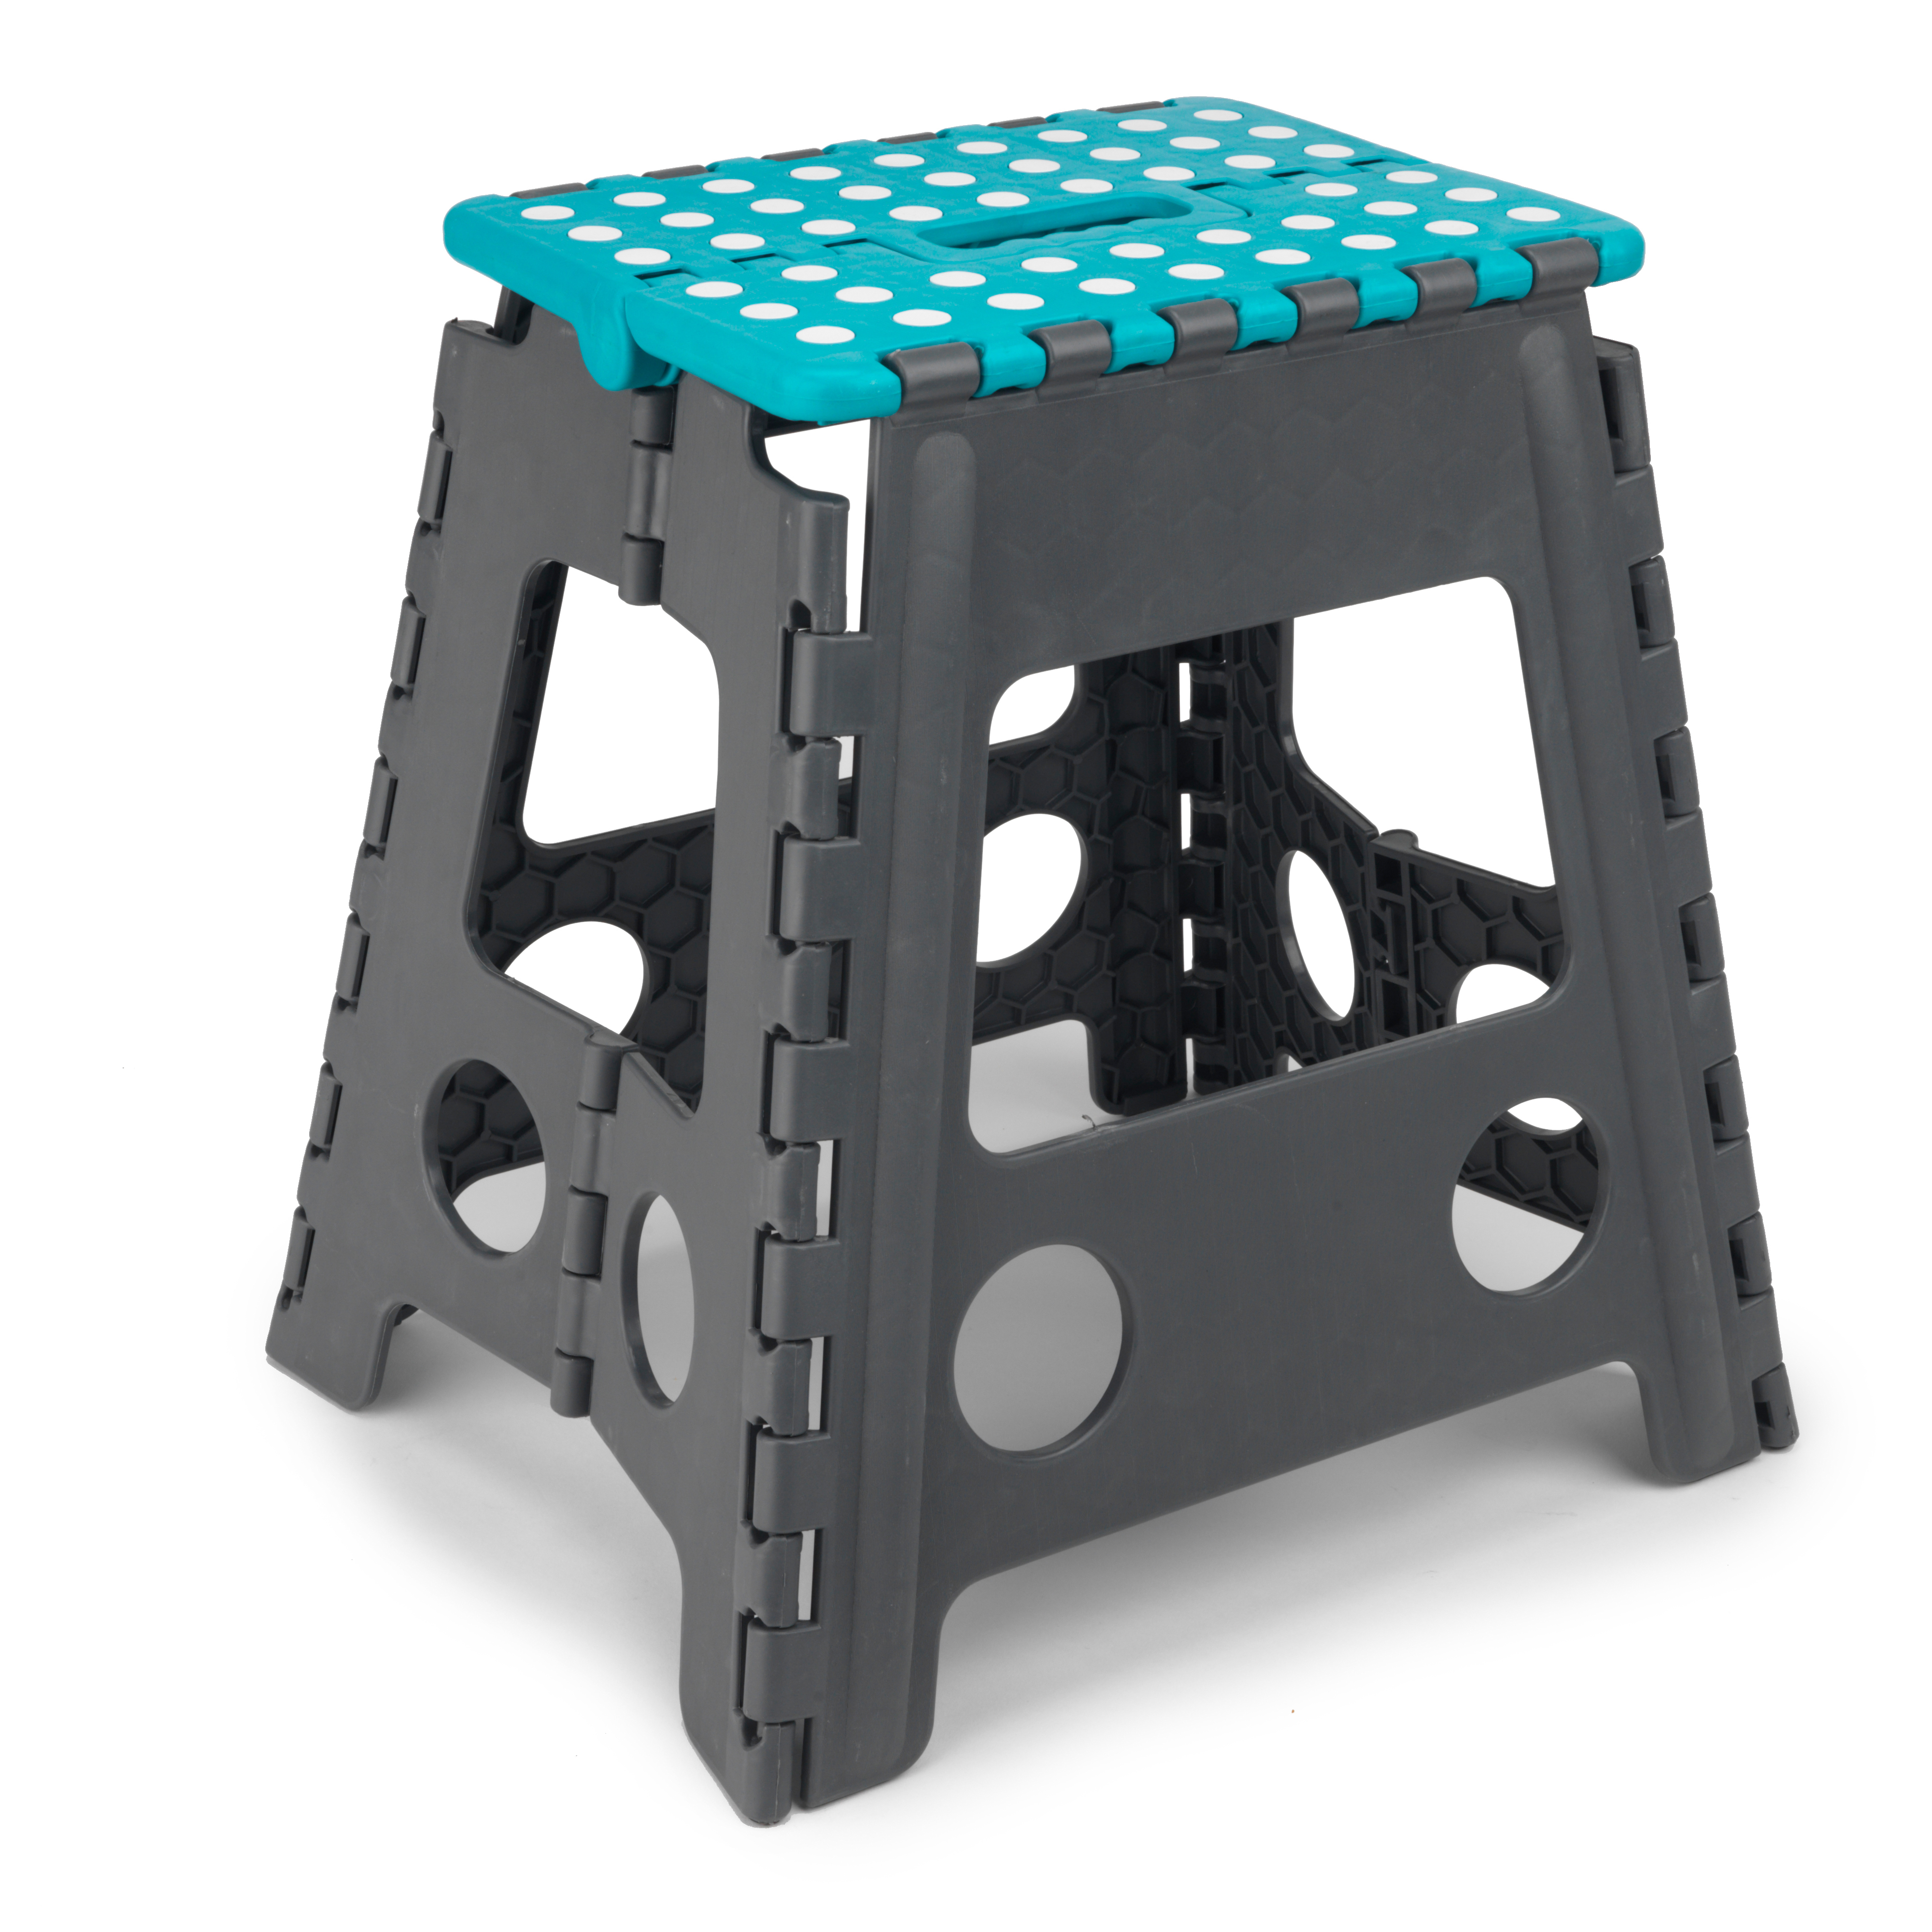 Beldray Diy Hobby Foldable Step Stool Large Plastic